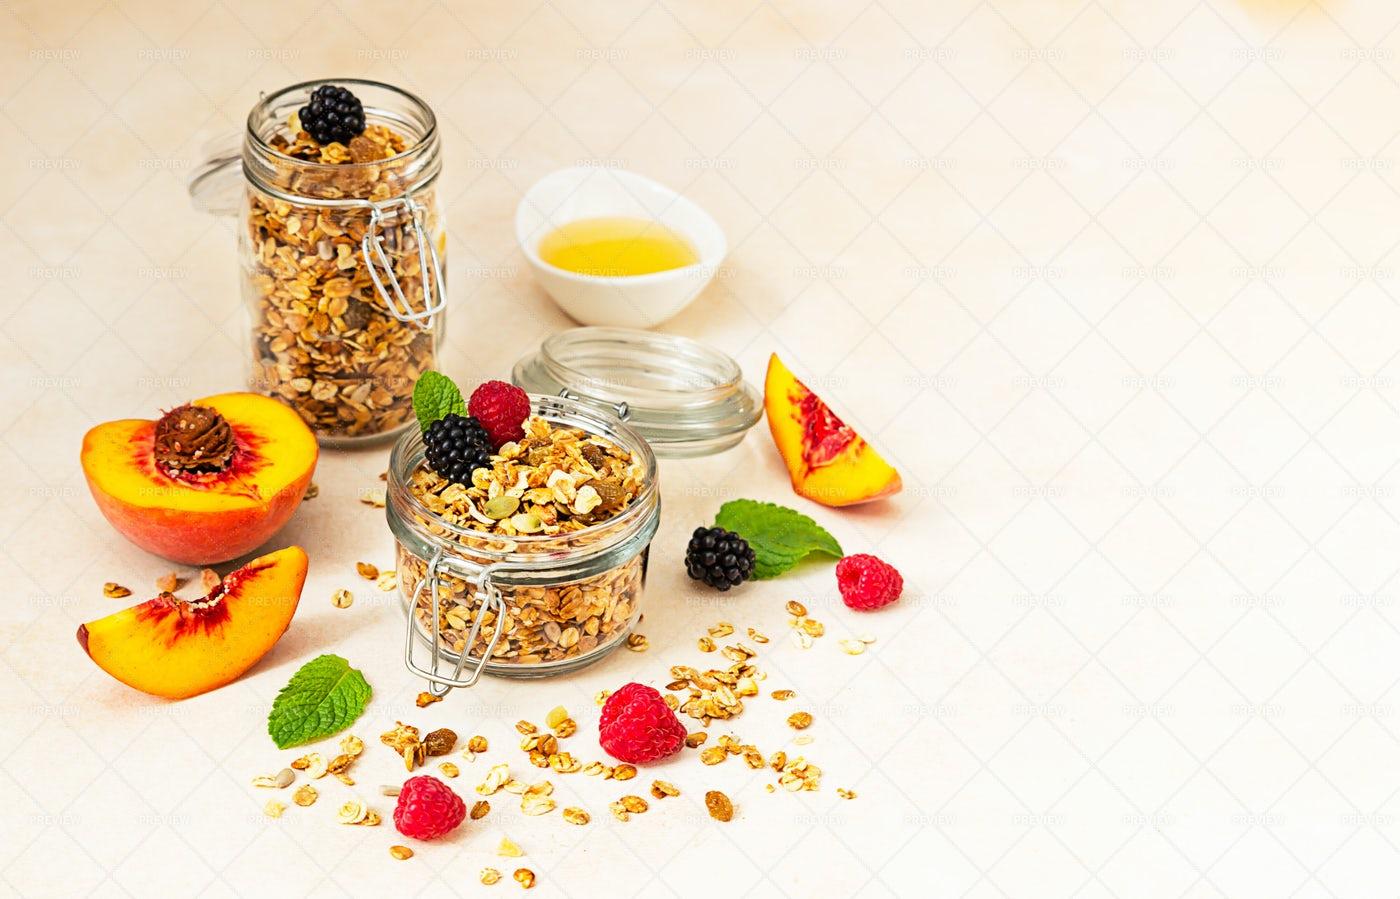 Homemade Granola In Jars Background: Stock Photos